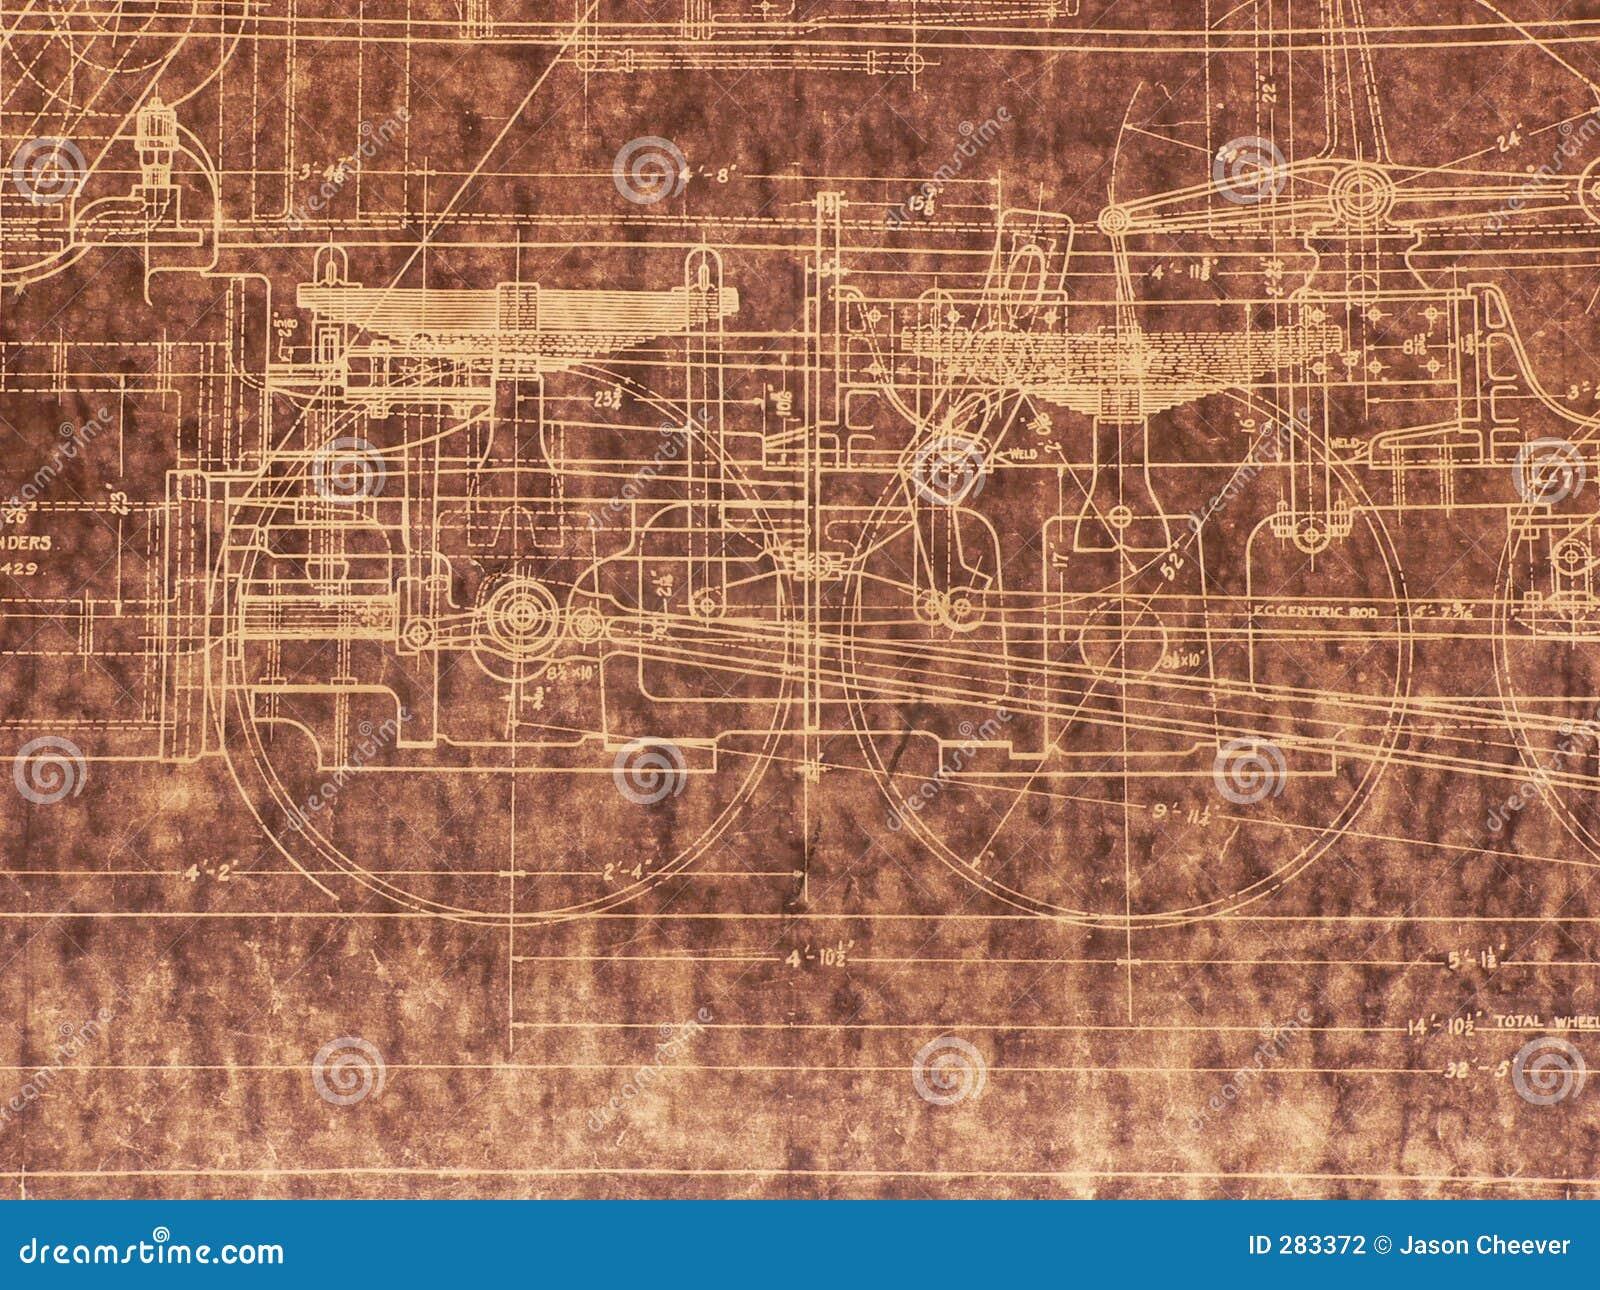 Old locomotive blueprint stock illustration illustration of past old locomotive blueprint malvernweather Images